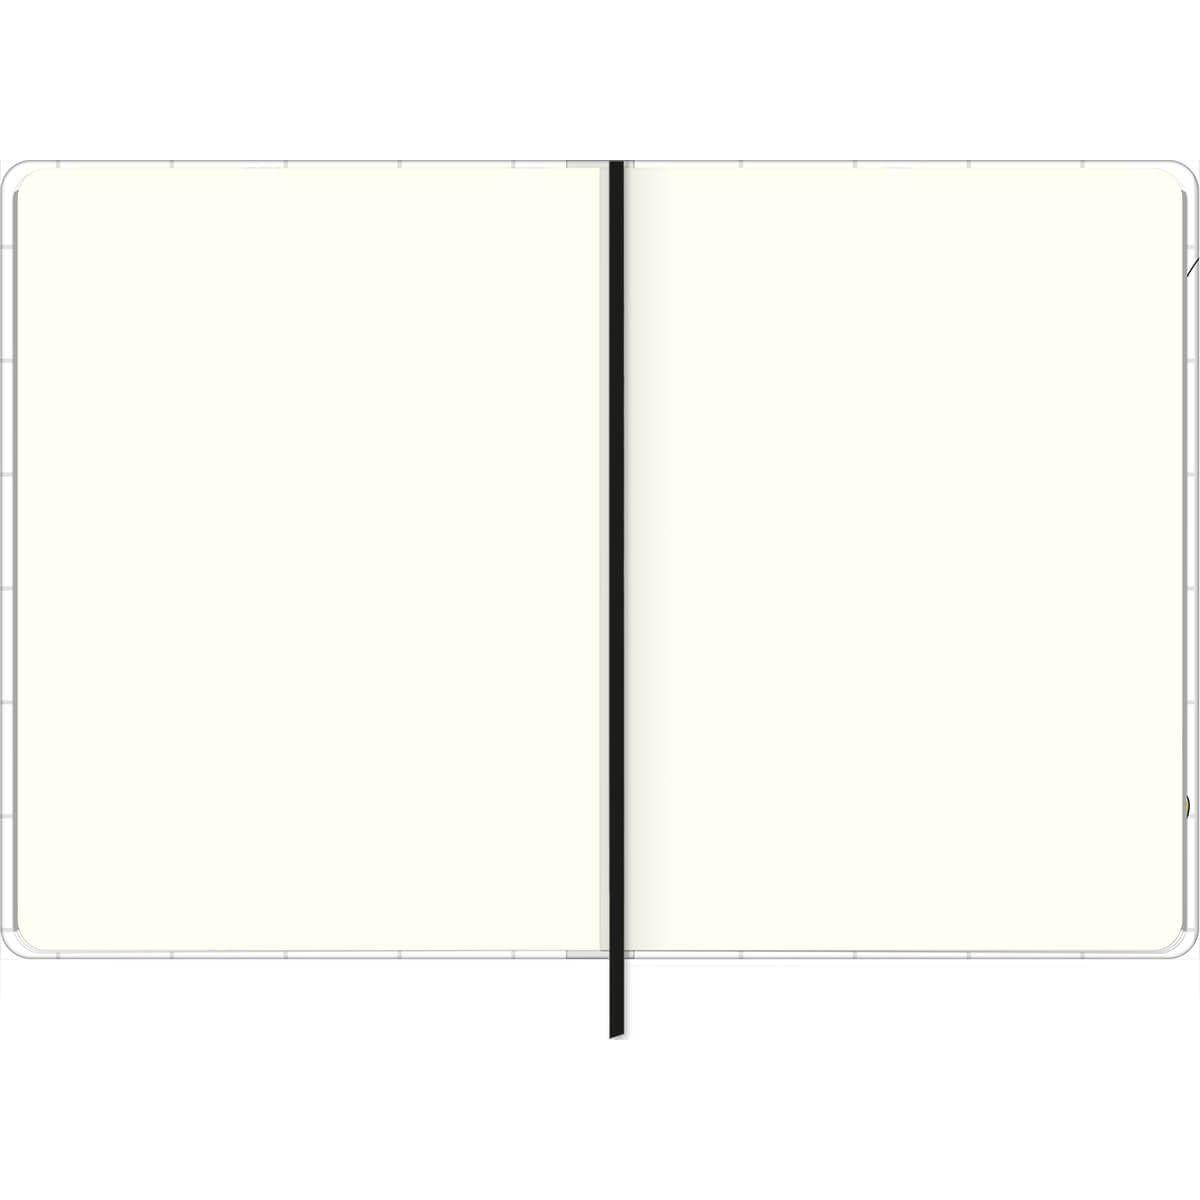 Caderno sem Pauta Costurado Capa Dura Fitto M Mickey 80 folhas Tilibra